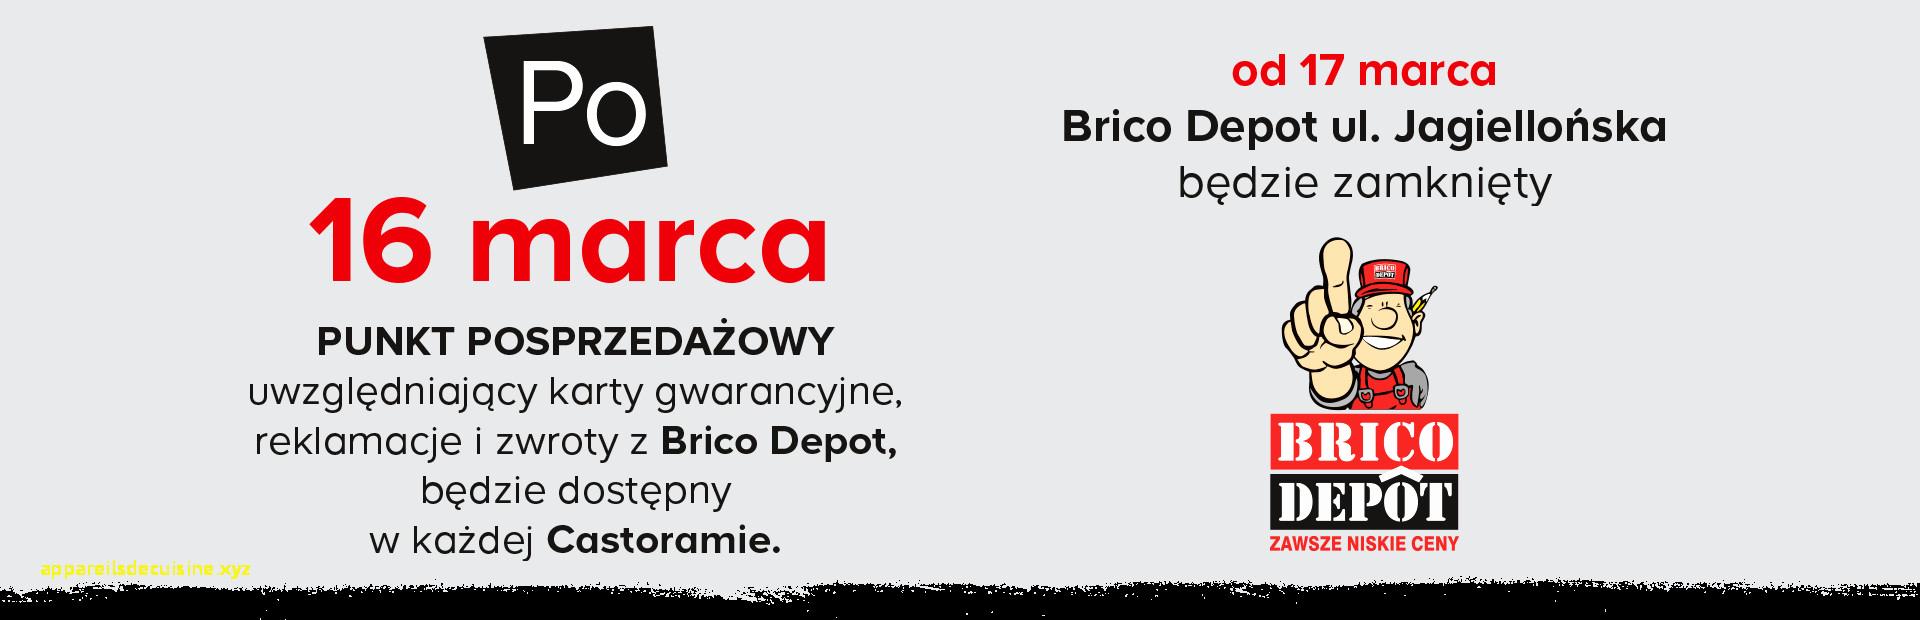 Salon De Jardin Brico Depot 2018 Inspirant Collection Fabuleux Intérieur éclairage Selon Salon De Jardin Brico Depot 2018